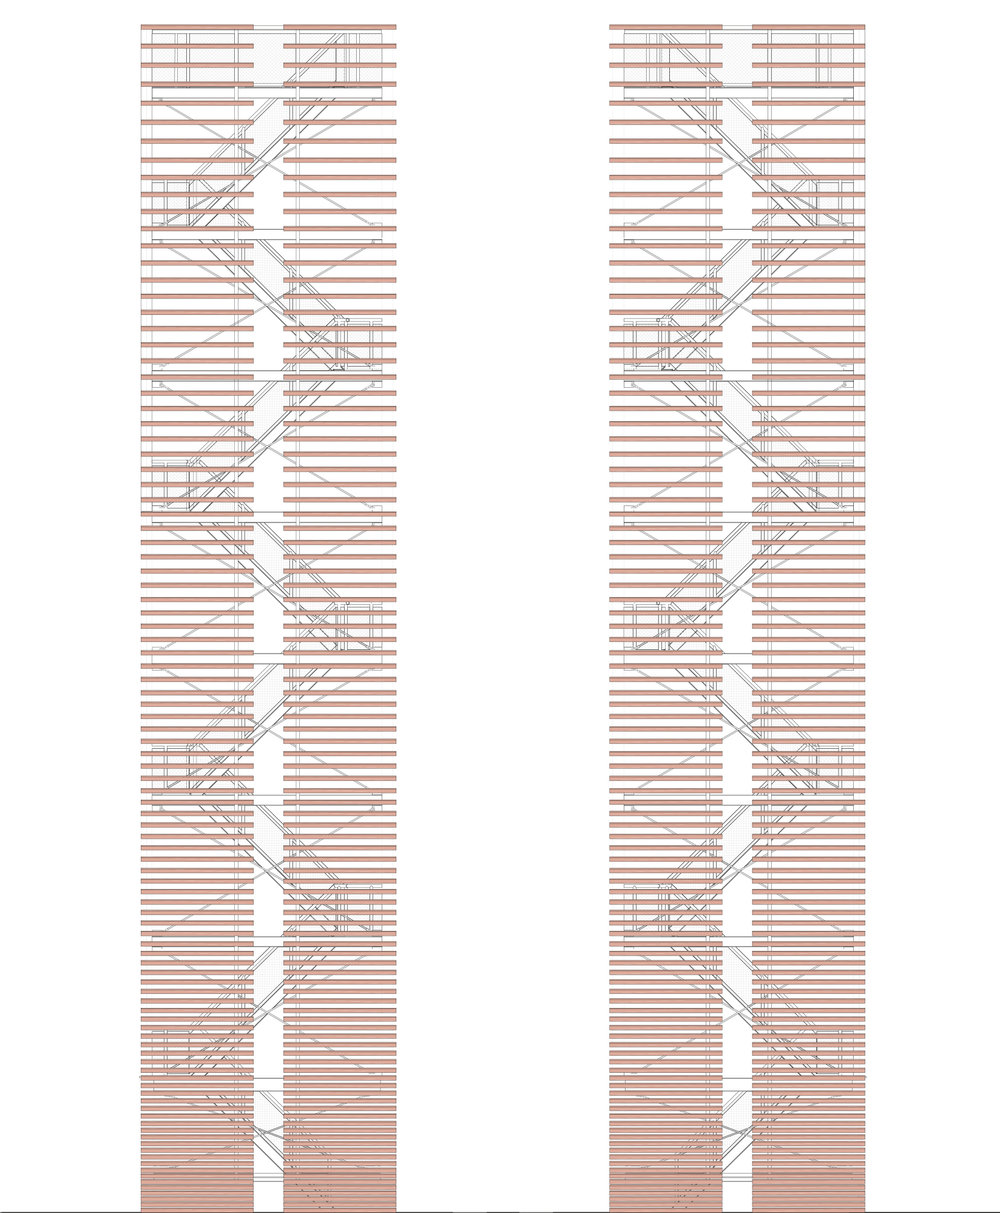 uitkijktoren - aanzicht detail.jpg